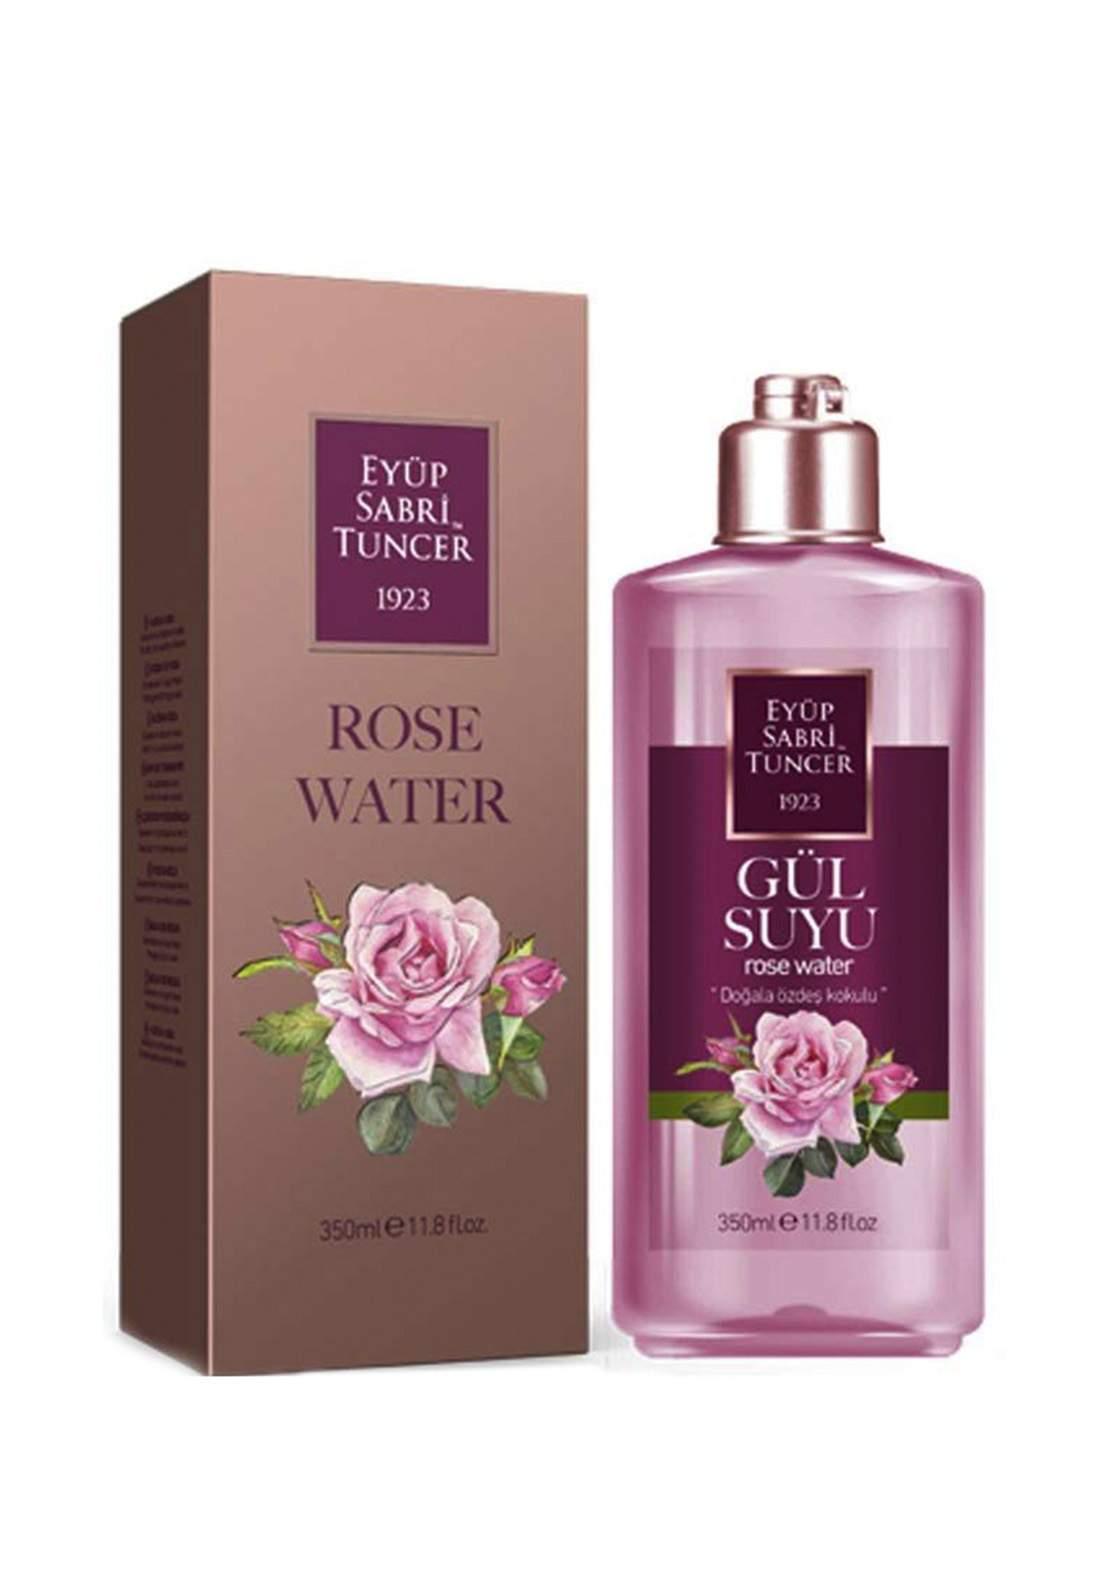 Eyup Sabri Tuncer Rose Water 350 ml مزيل مكياج بماء الورد